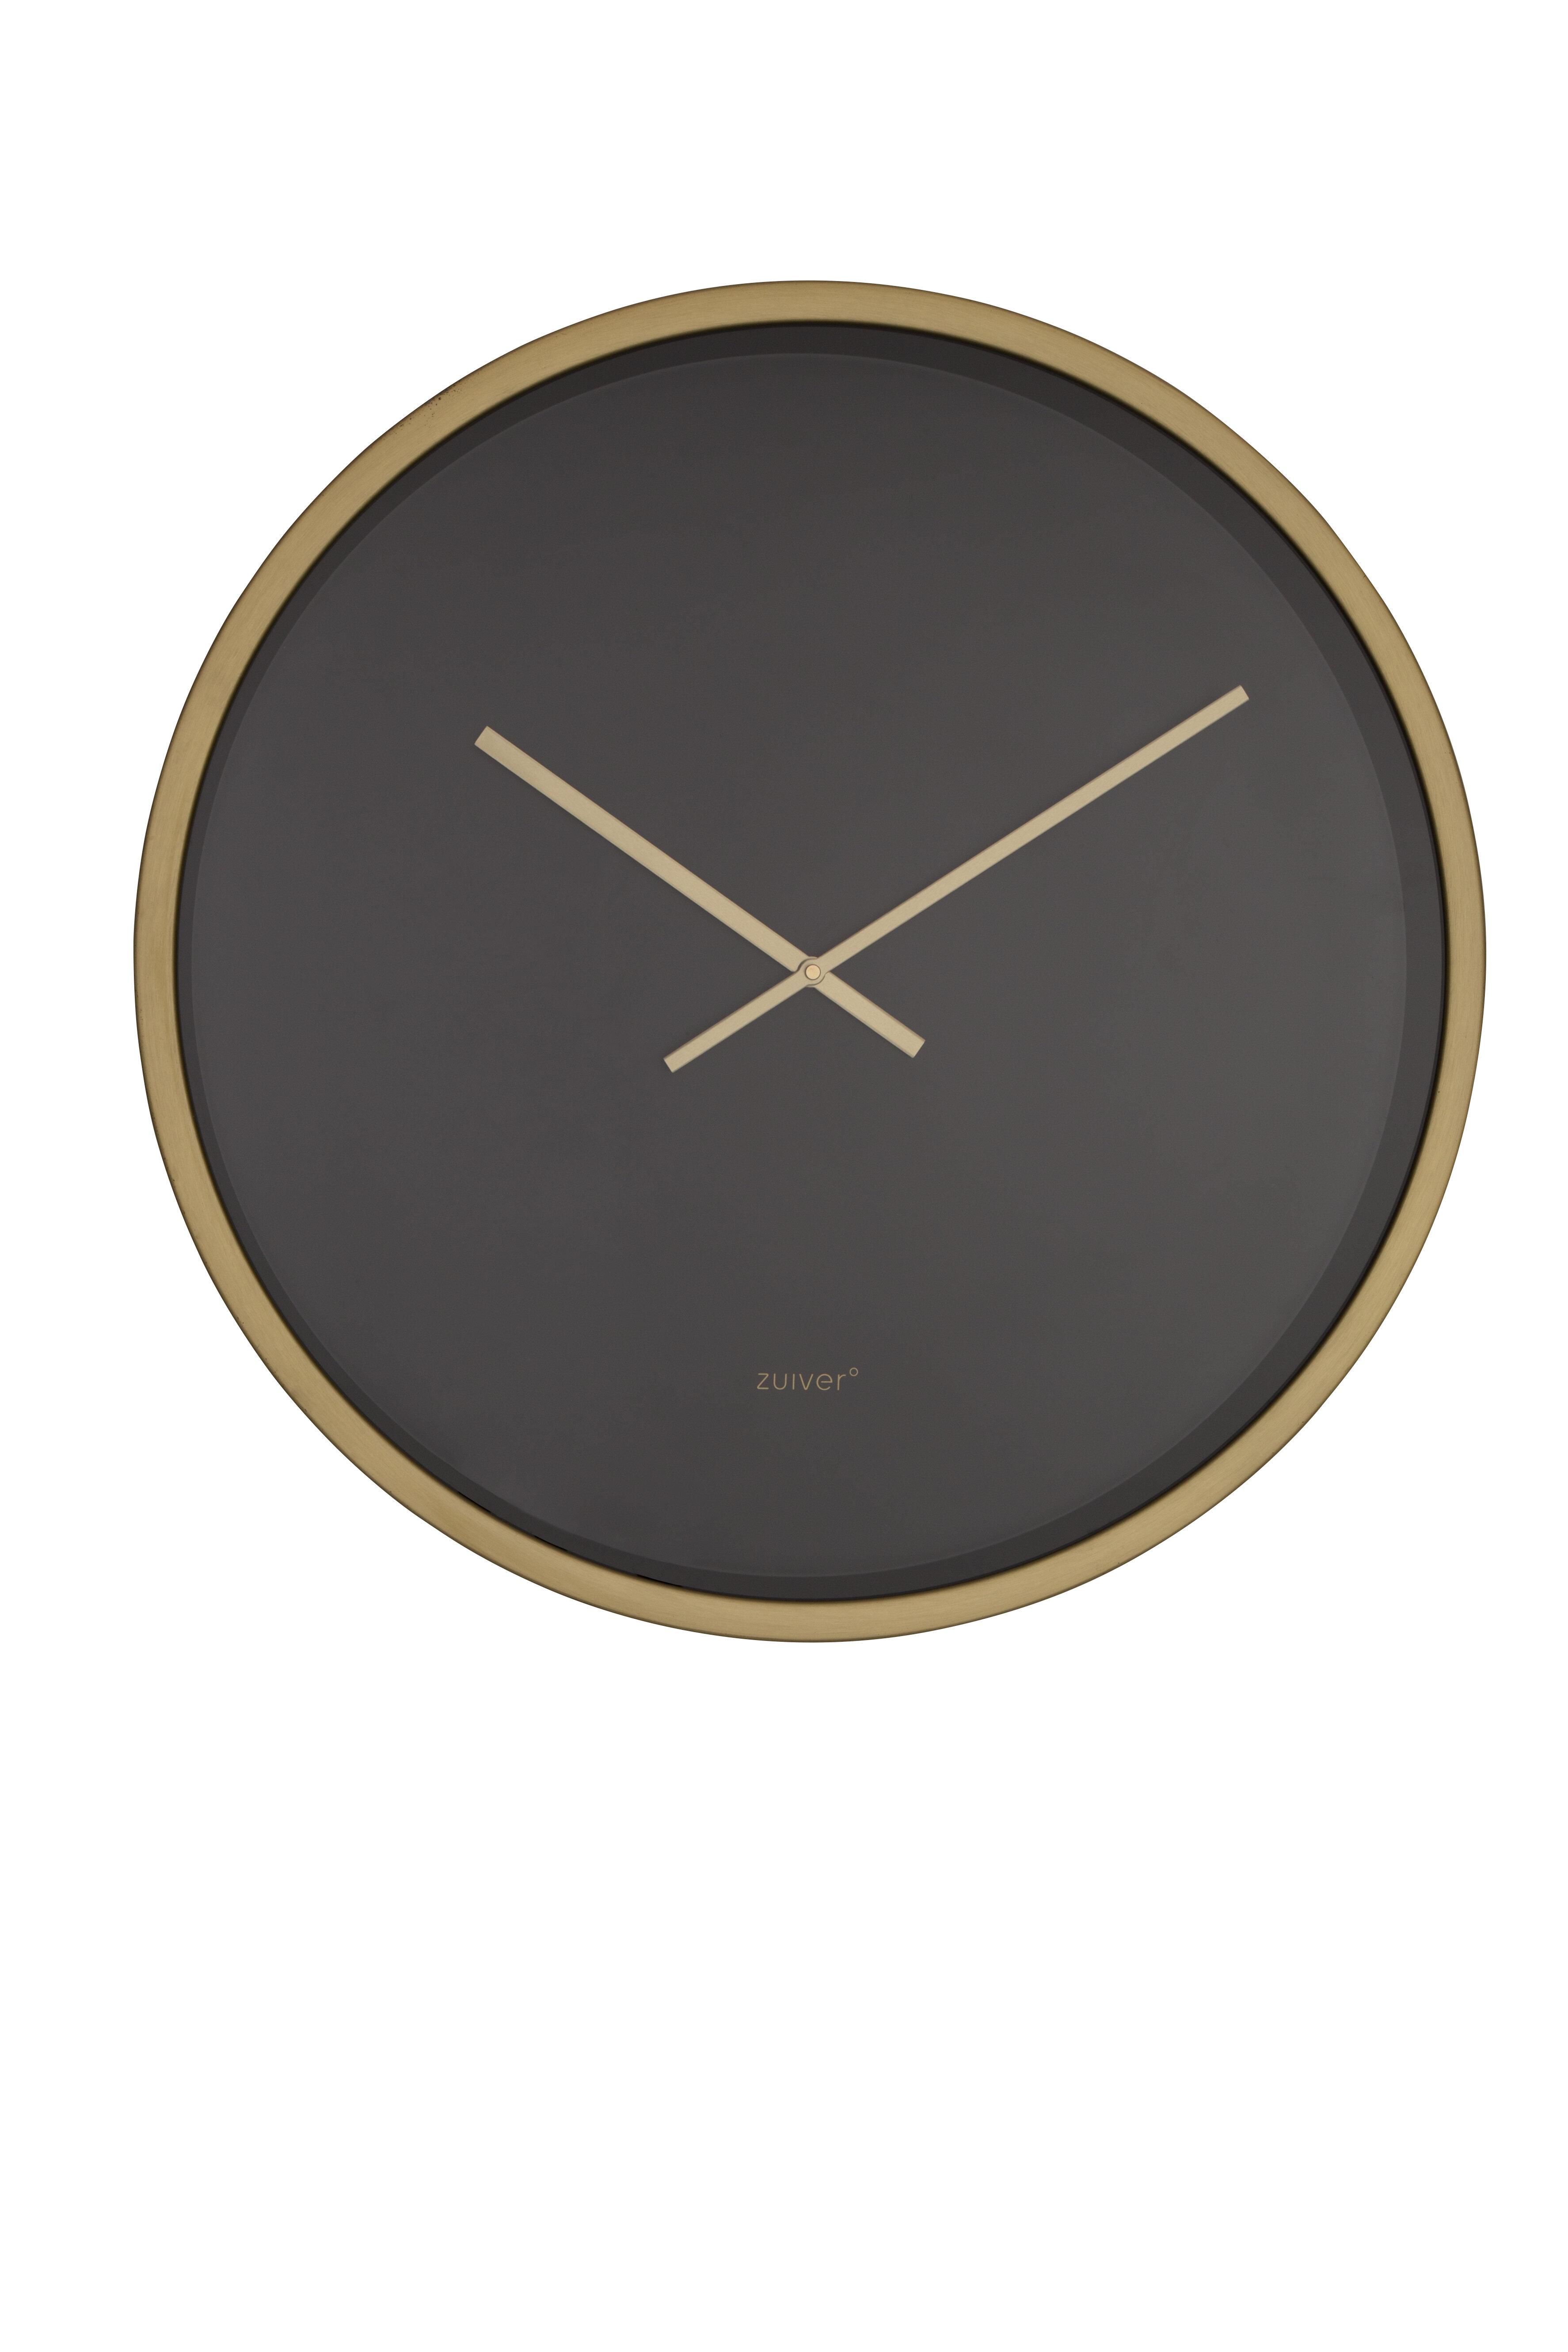 Brass Large Wall Clocks You Ll Love In 2021 Wayfair